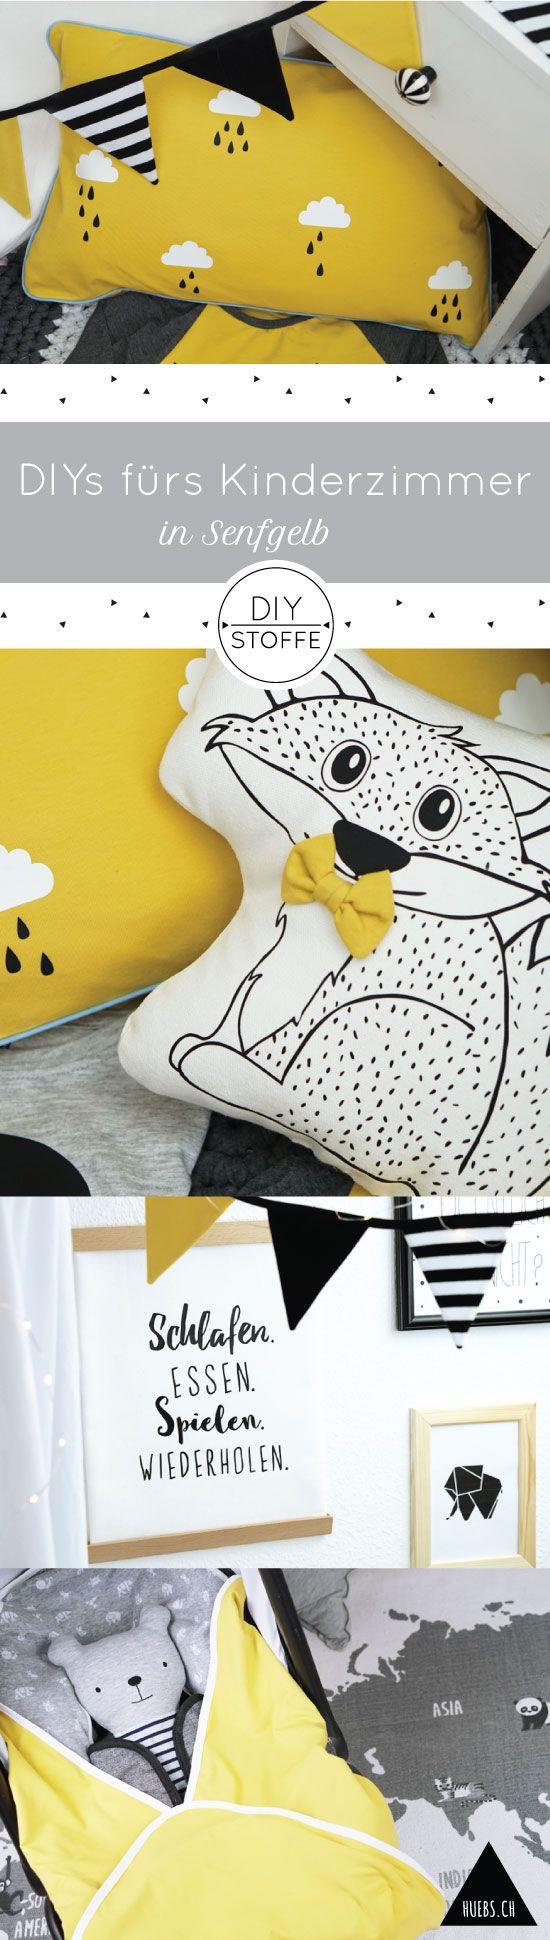 Zauberhaufte DIY-Näh Ideen fürs Kinderzimmer in Senfgelb - Anleitungen, Schnittmuster  & Plottermotive - Ebooks/Freebooks bei diy-stoffe.de